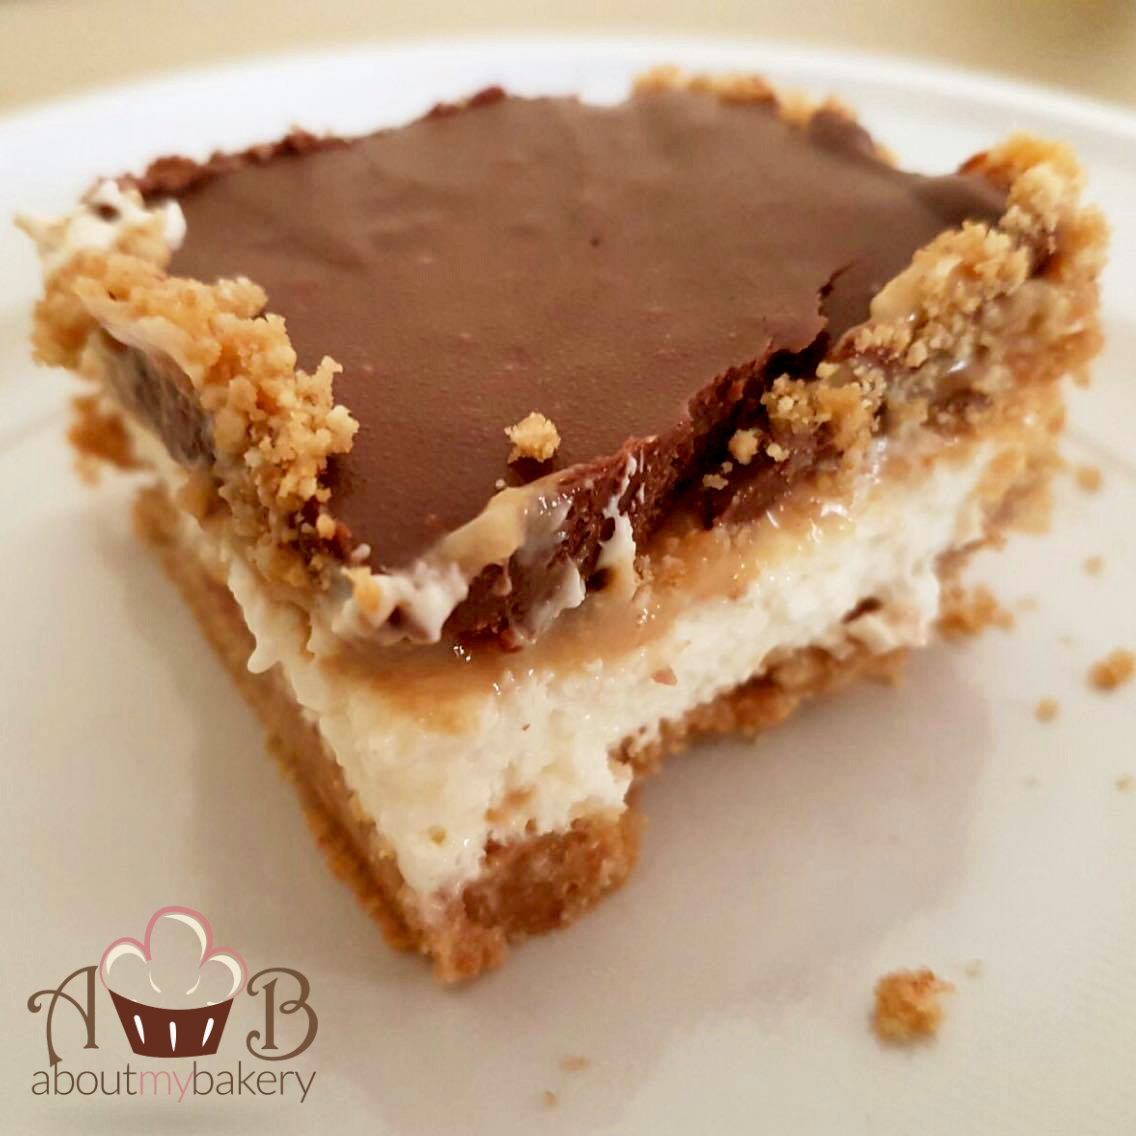 Torta twix cheesecake - Ricetta golosa